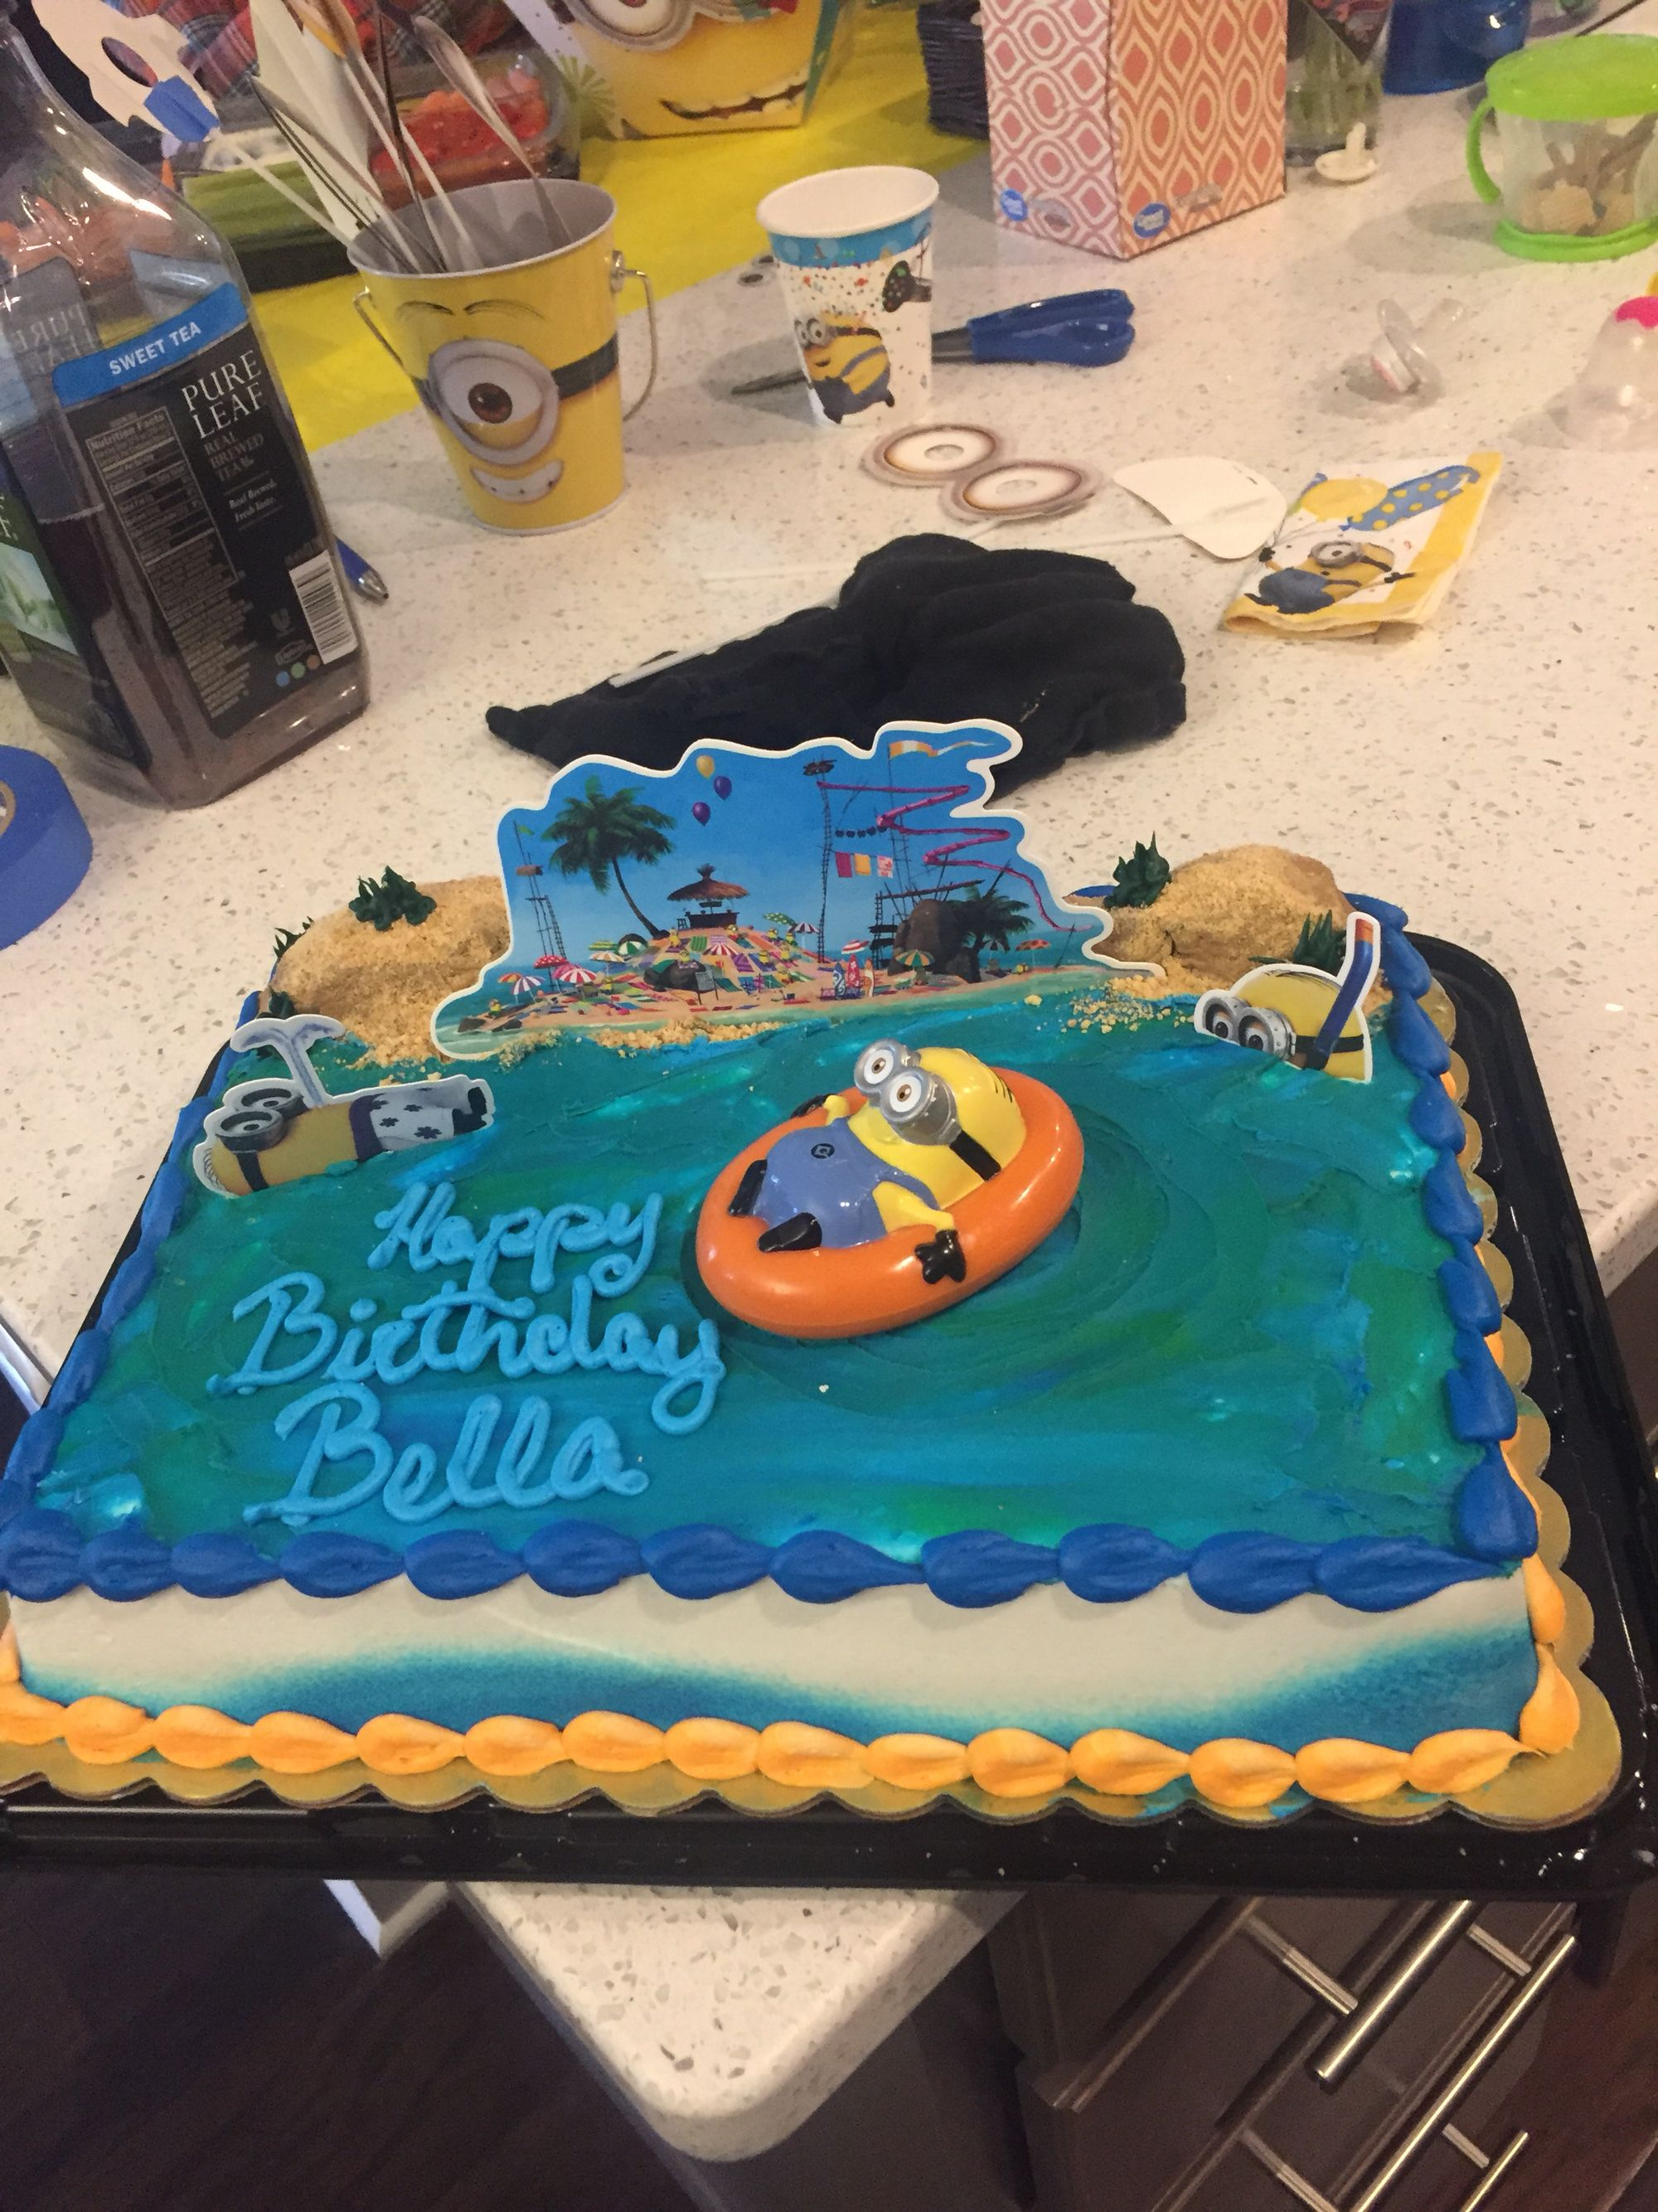 Pleasant Minion Birthday Cake From Harris Teeter Minion Birthday Cake Personalised Birthday Cards Veneteletsinfo